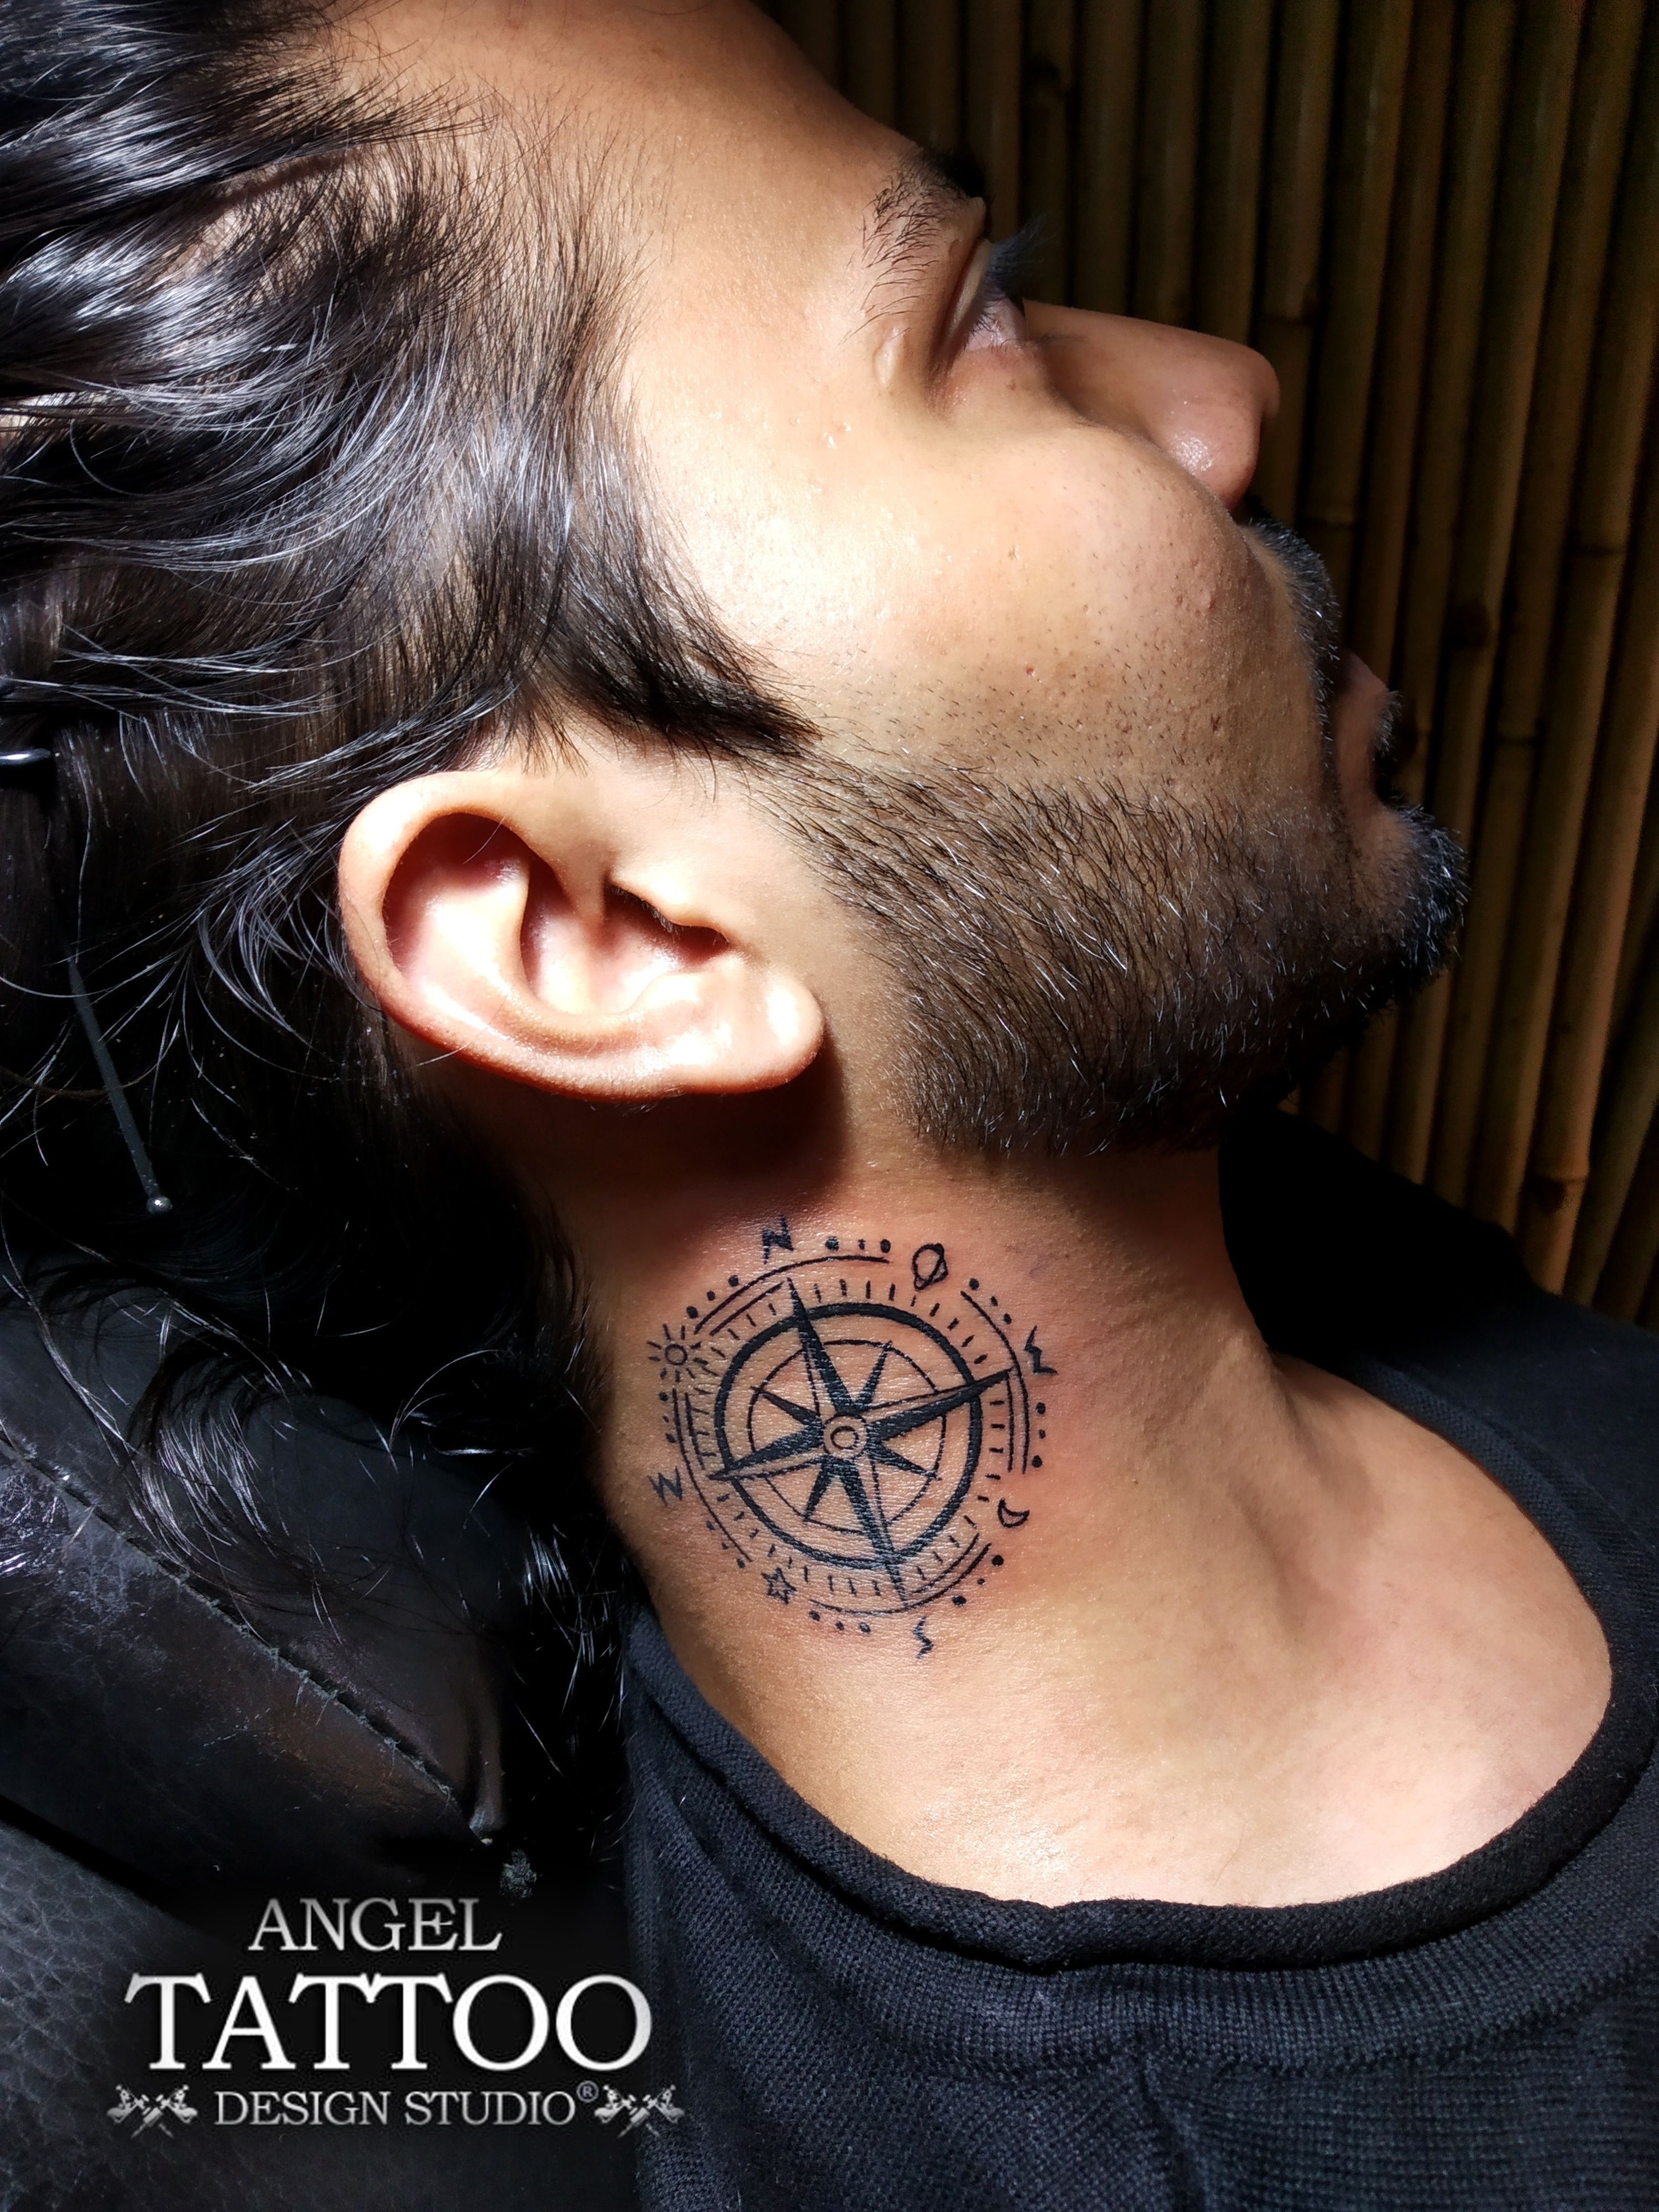 Compass tattoo on neck made at gurgaon tattoo center